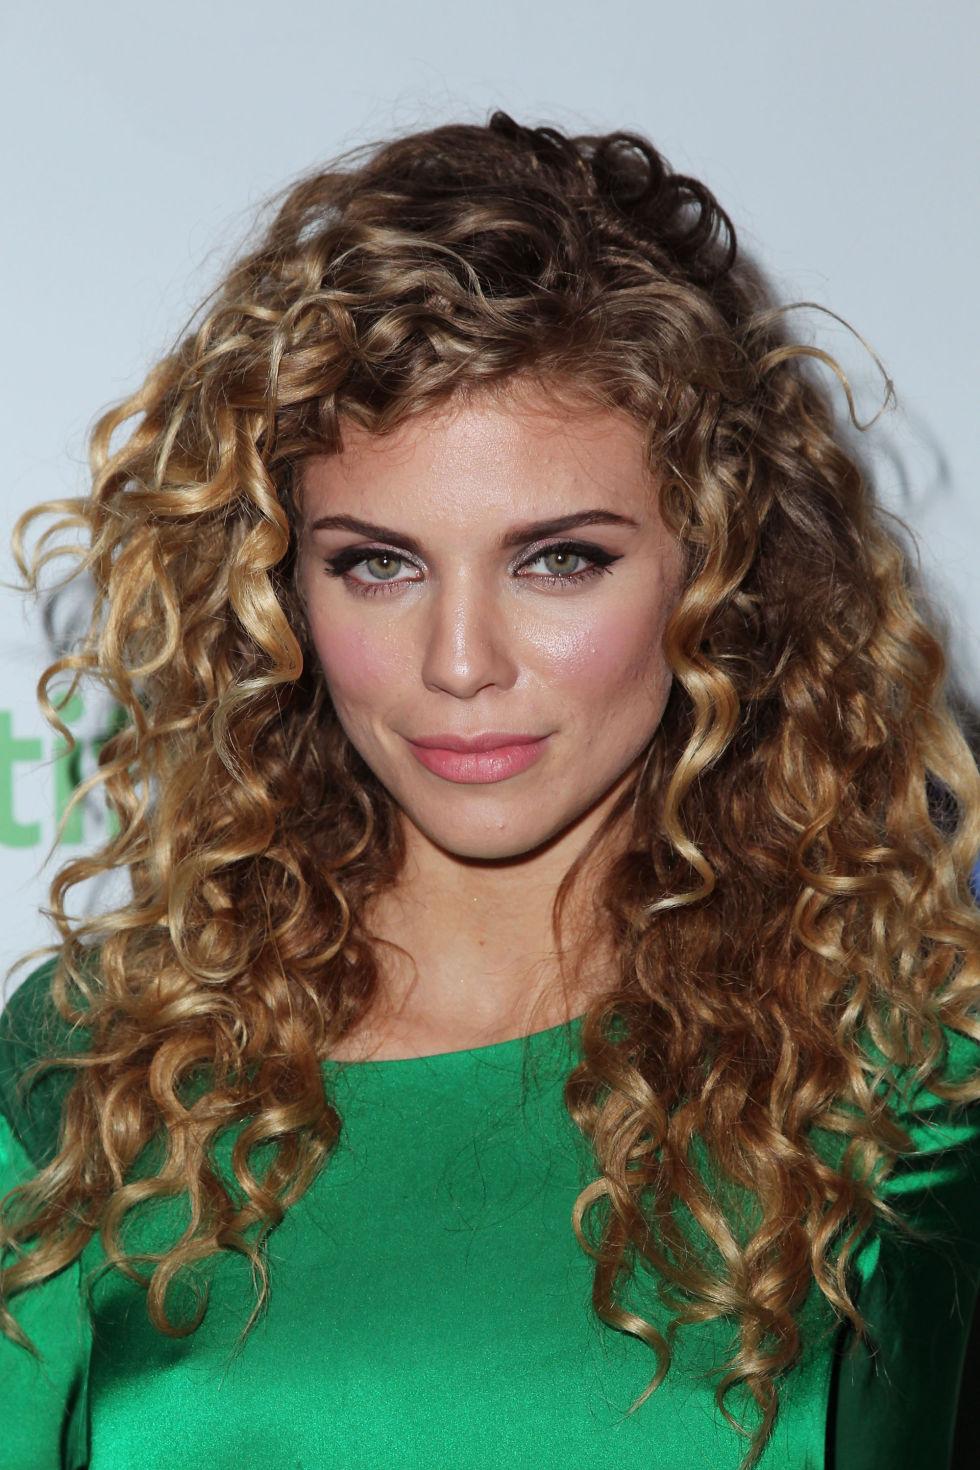 Incredible 30 Best Curly Hairstyles Of 2017 Cute Hairstyles For Curly Hair Short Hairstyles For Black Women Fulllsitofus